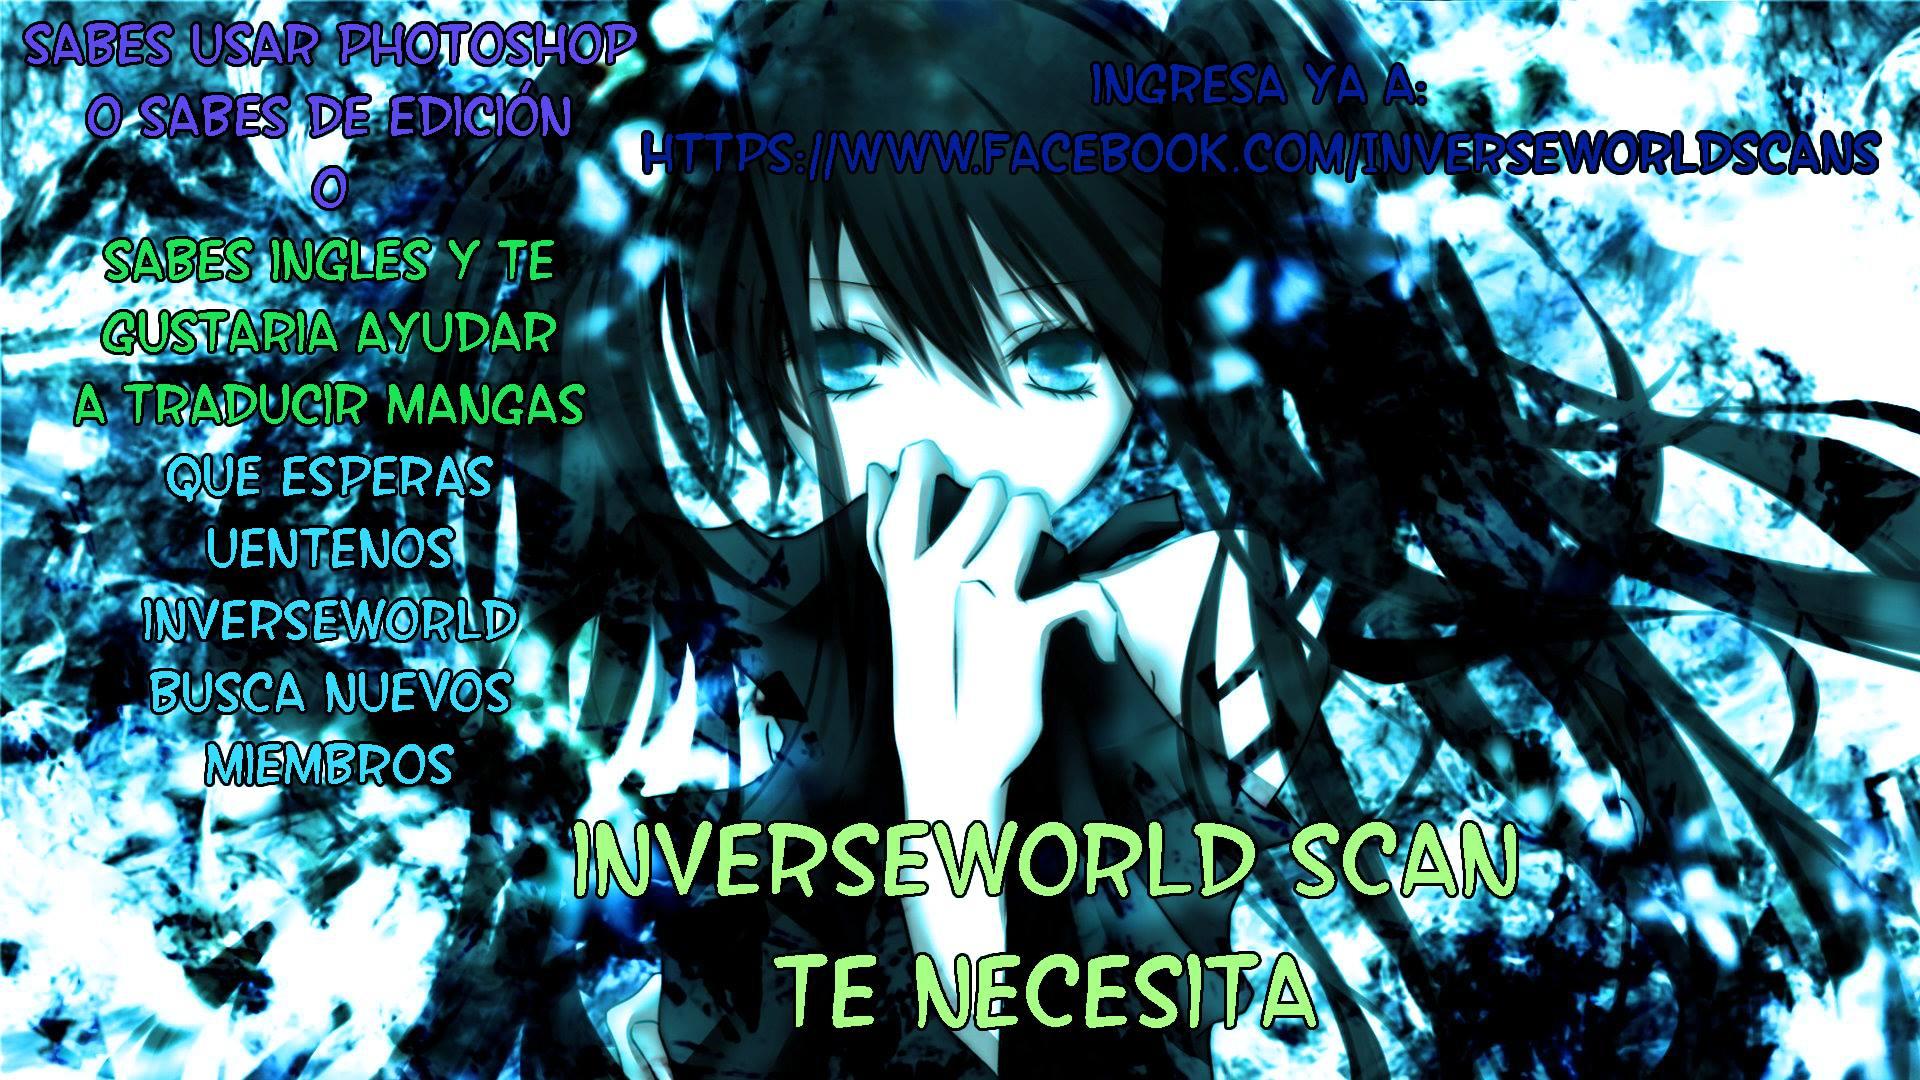 http://c5.ninemanga.com/es_manga/18/16210/415311/71103463cca58f868394462cc92e854d.jpg Page 1